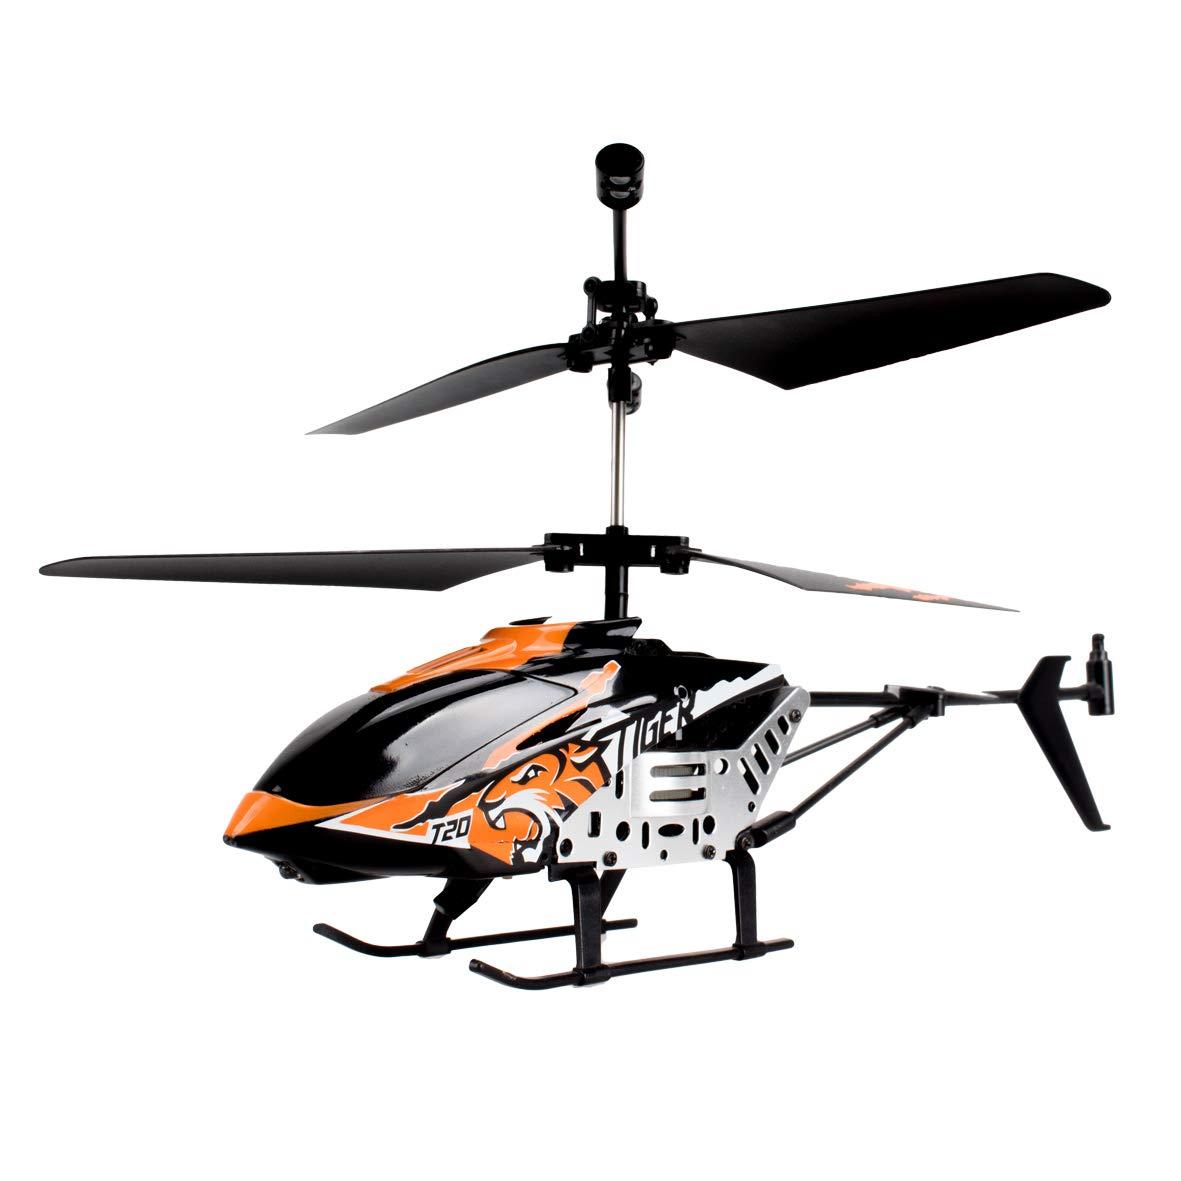 World Brands- Heli Tiger, Juguete, teledirigidos, radiocontrol, Aviones a Control Remoto, helicopteros RC, 33.0 x 33.0 x 9.9 (80285)